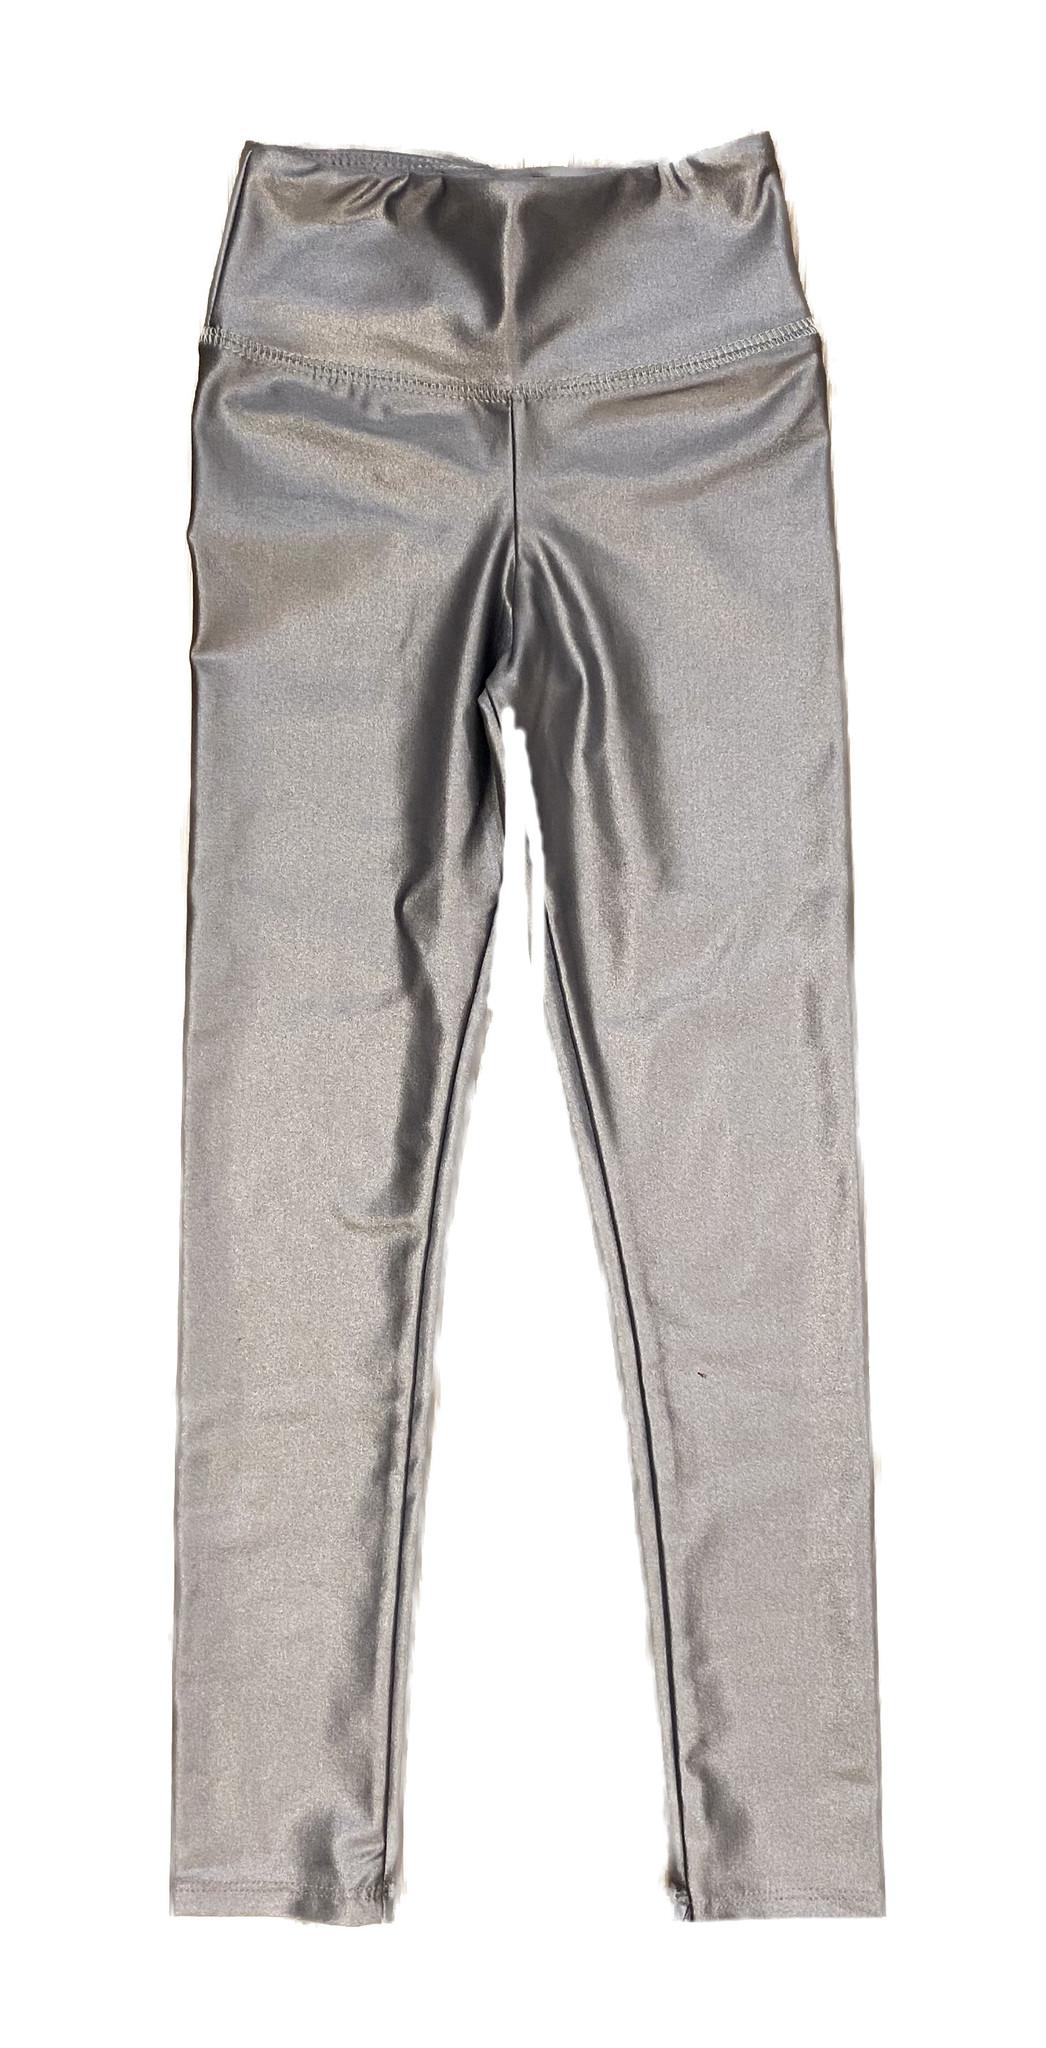 Katie J NYC Brit Wet Silver/Grey legging